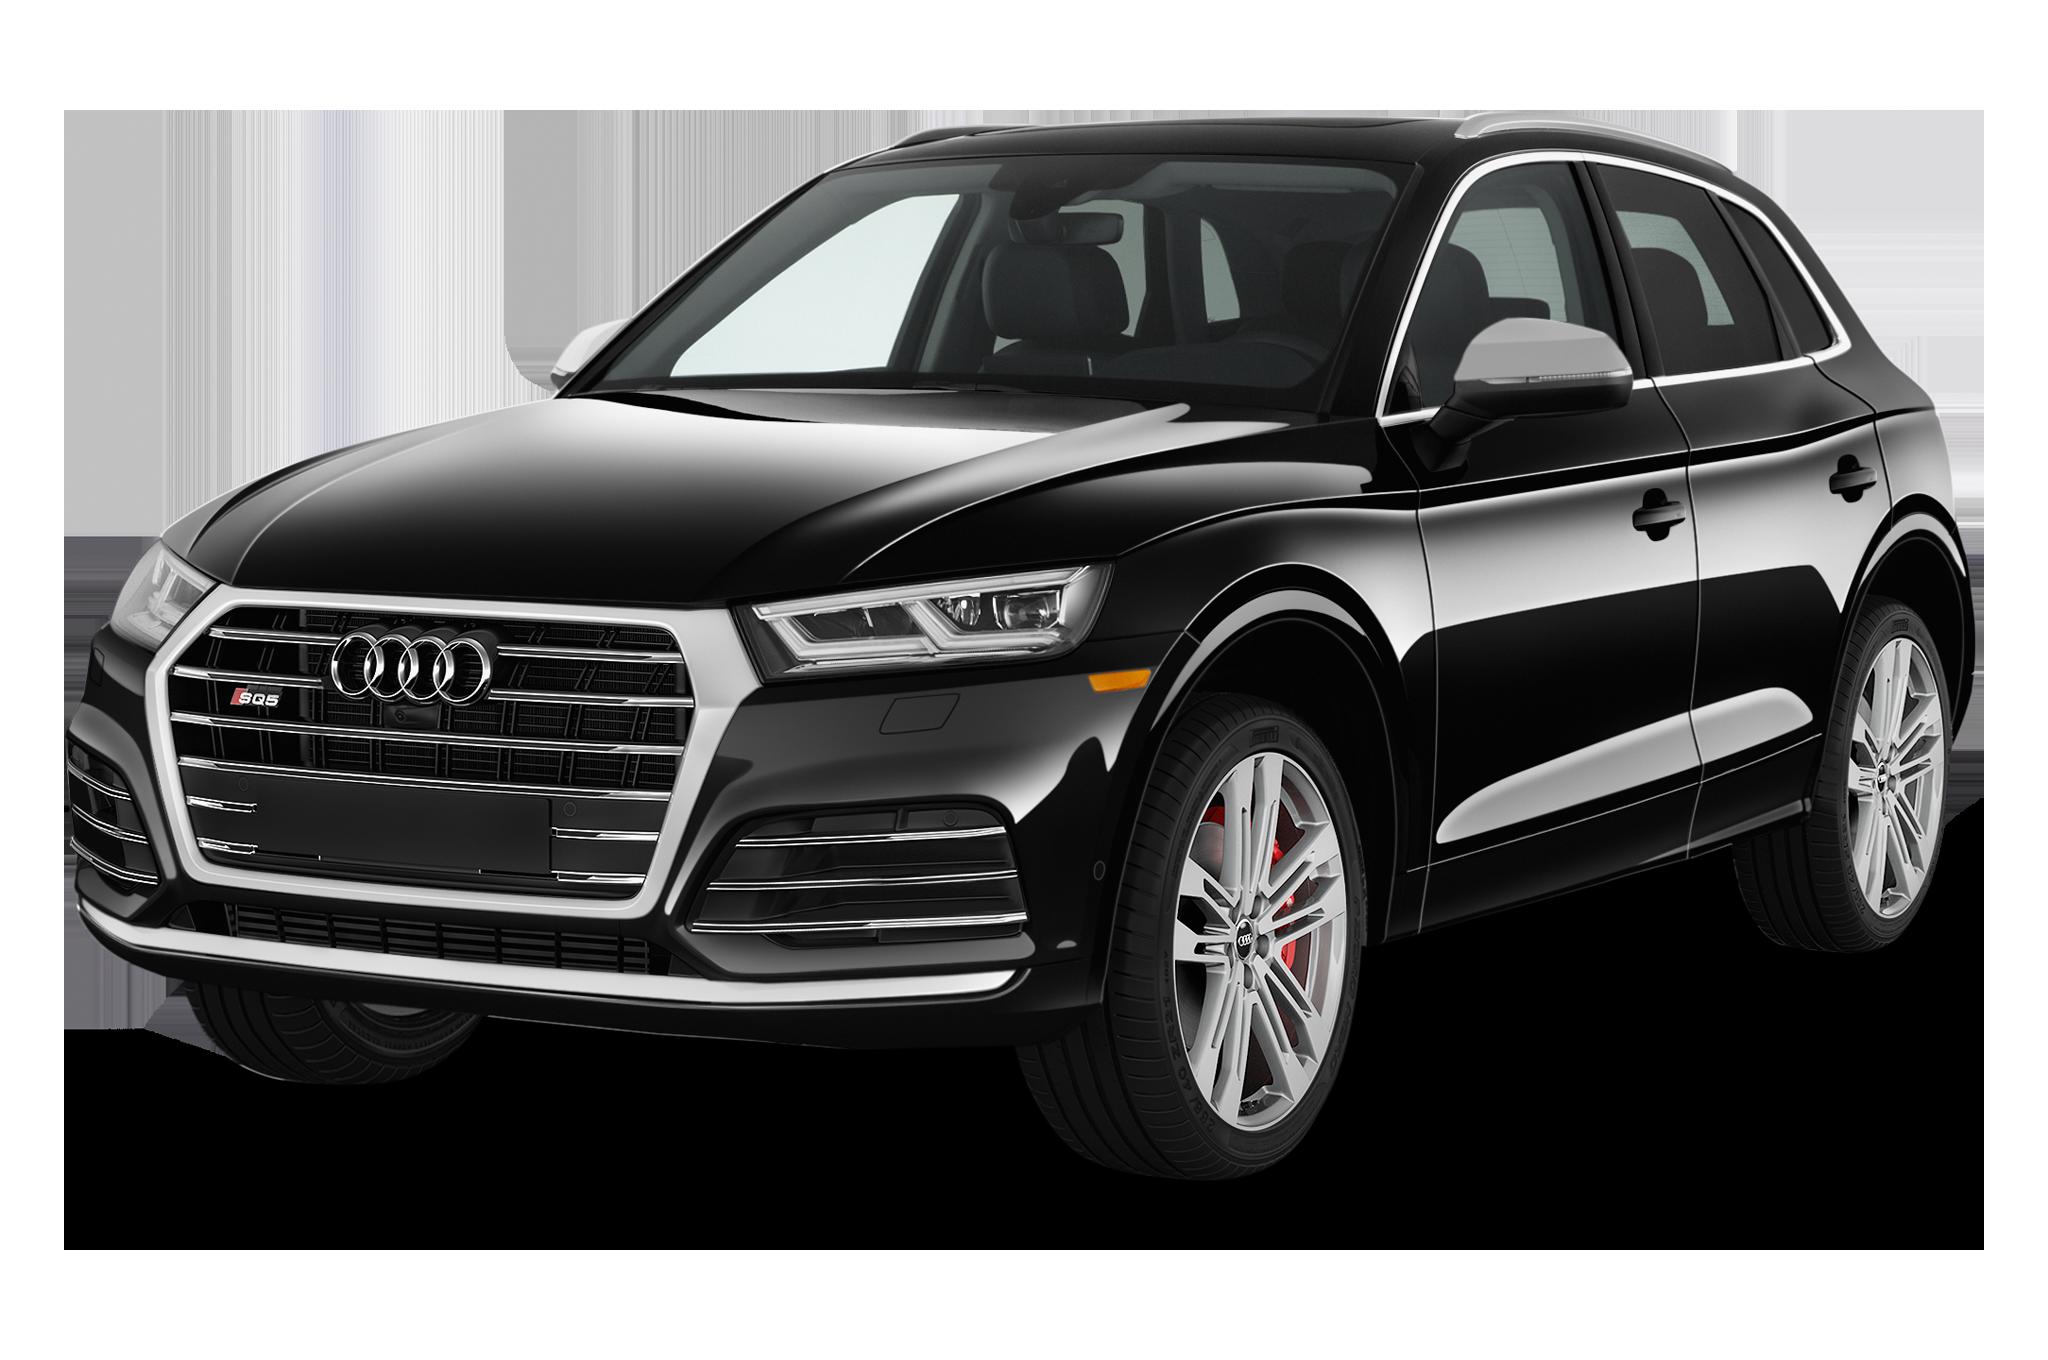 2018 Audi SQ5 Overview